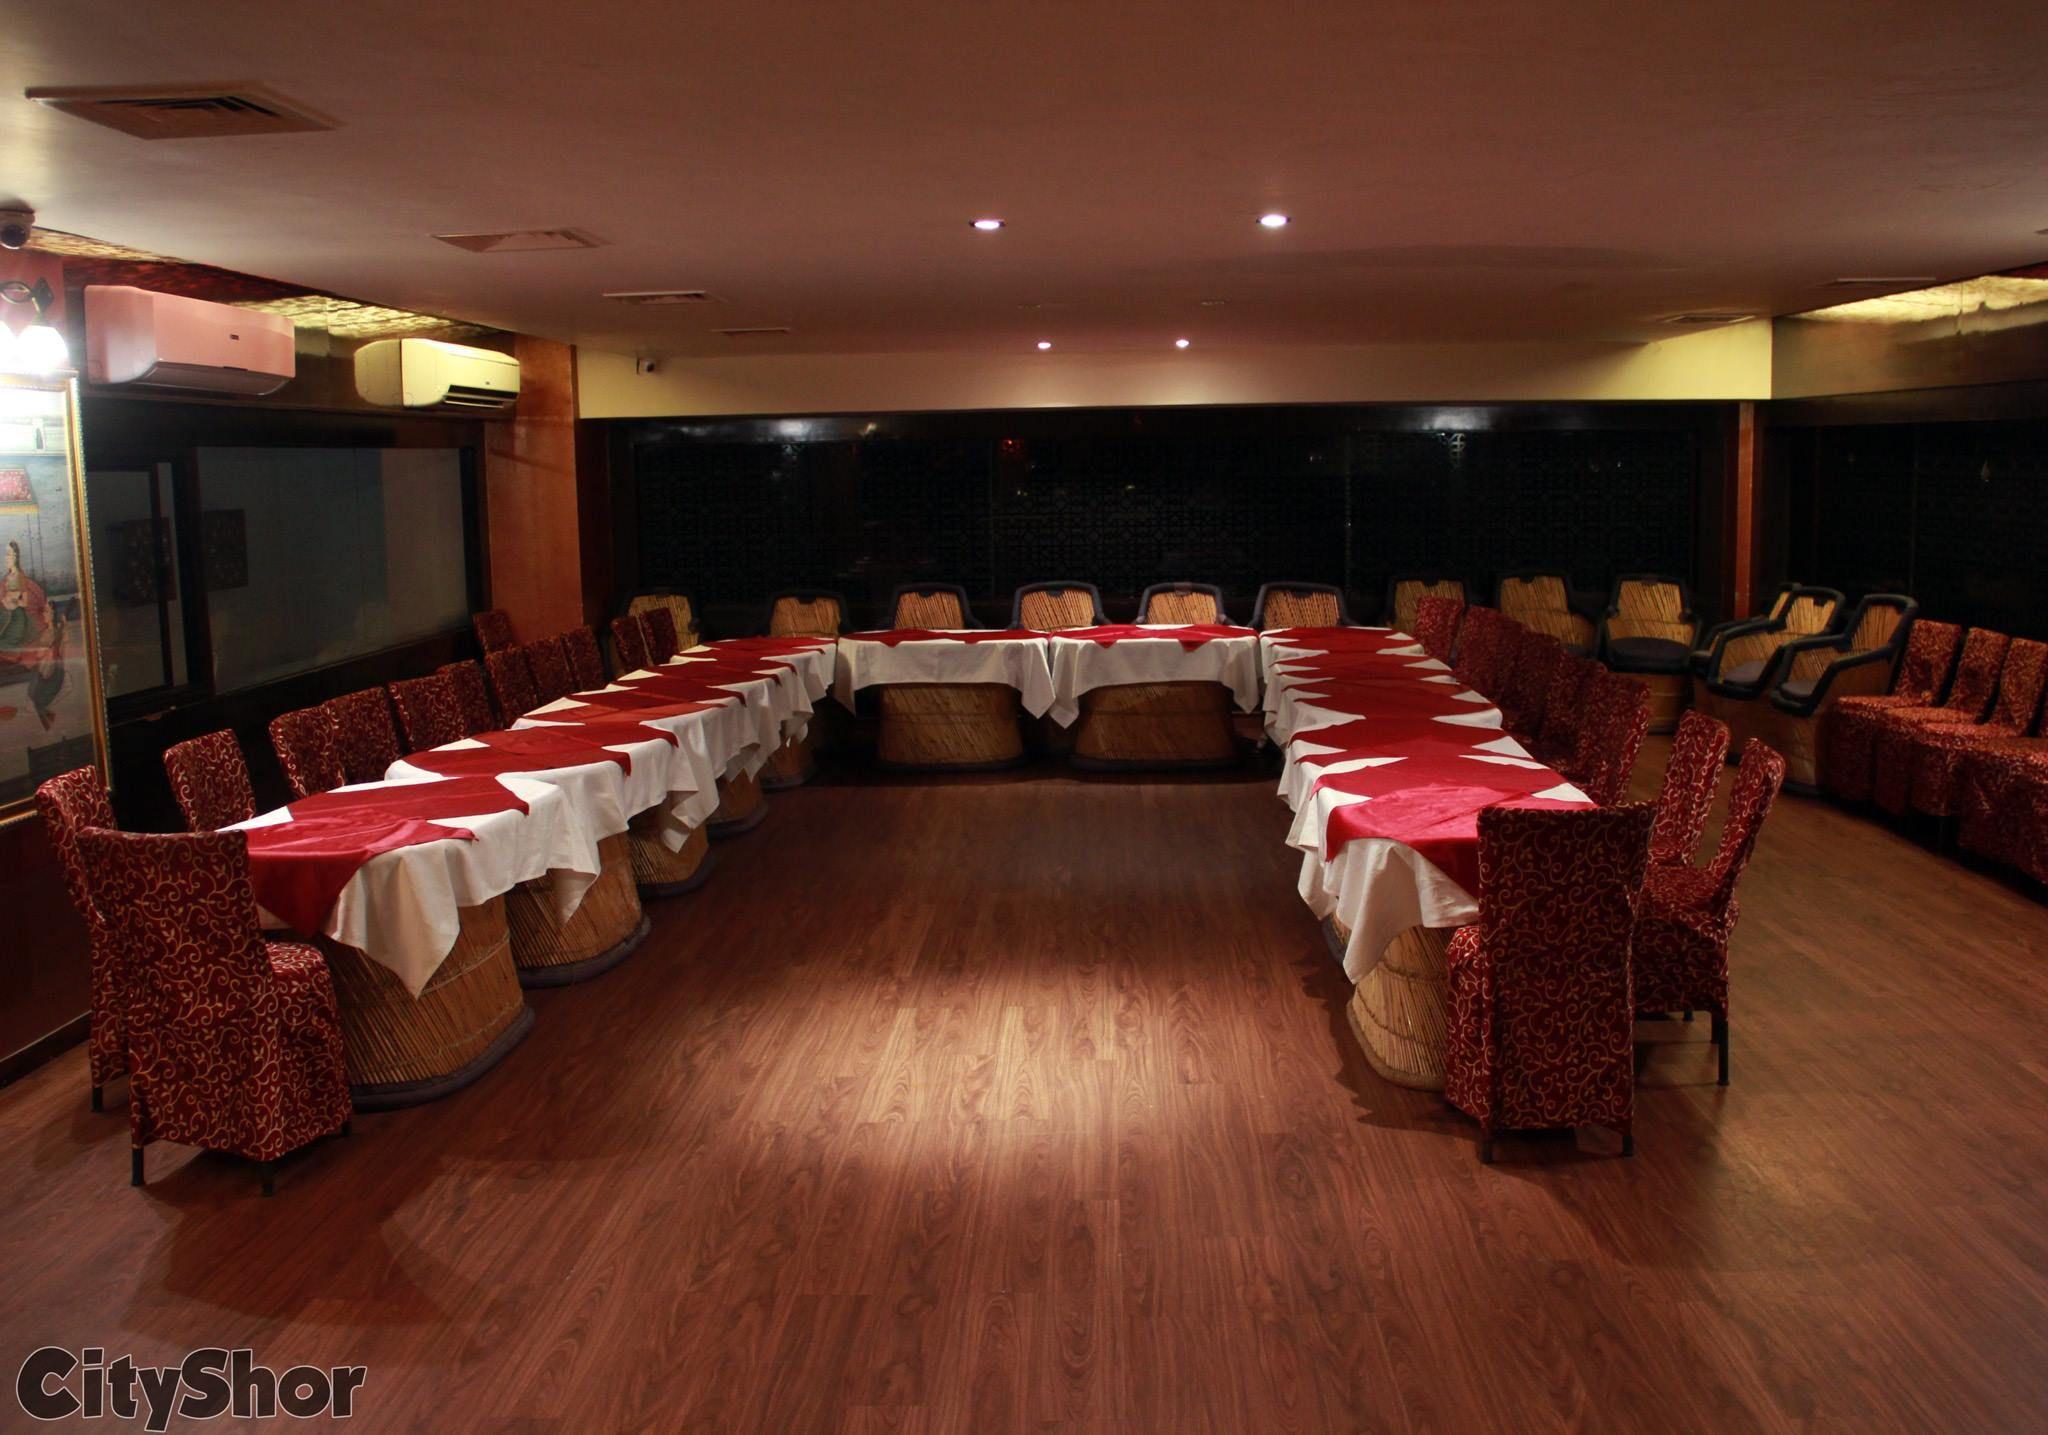 This dish is served only at #MughalRasoi in Rajasthan Mughal Rasoi Address: 7th Floor, City Corporate Tower, Malviya Marg, C-Scheme, Ashok Nagar Call: 0141-4009996  #Restaurants #Food #Romantic #CityShorJaipur